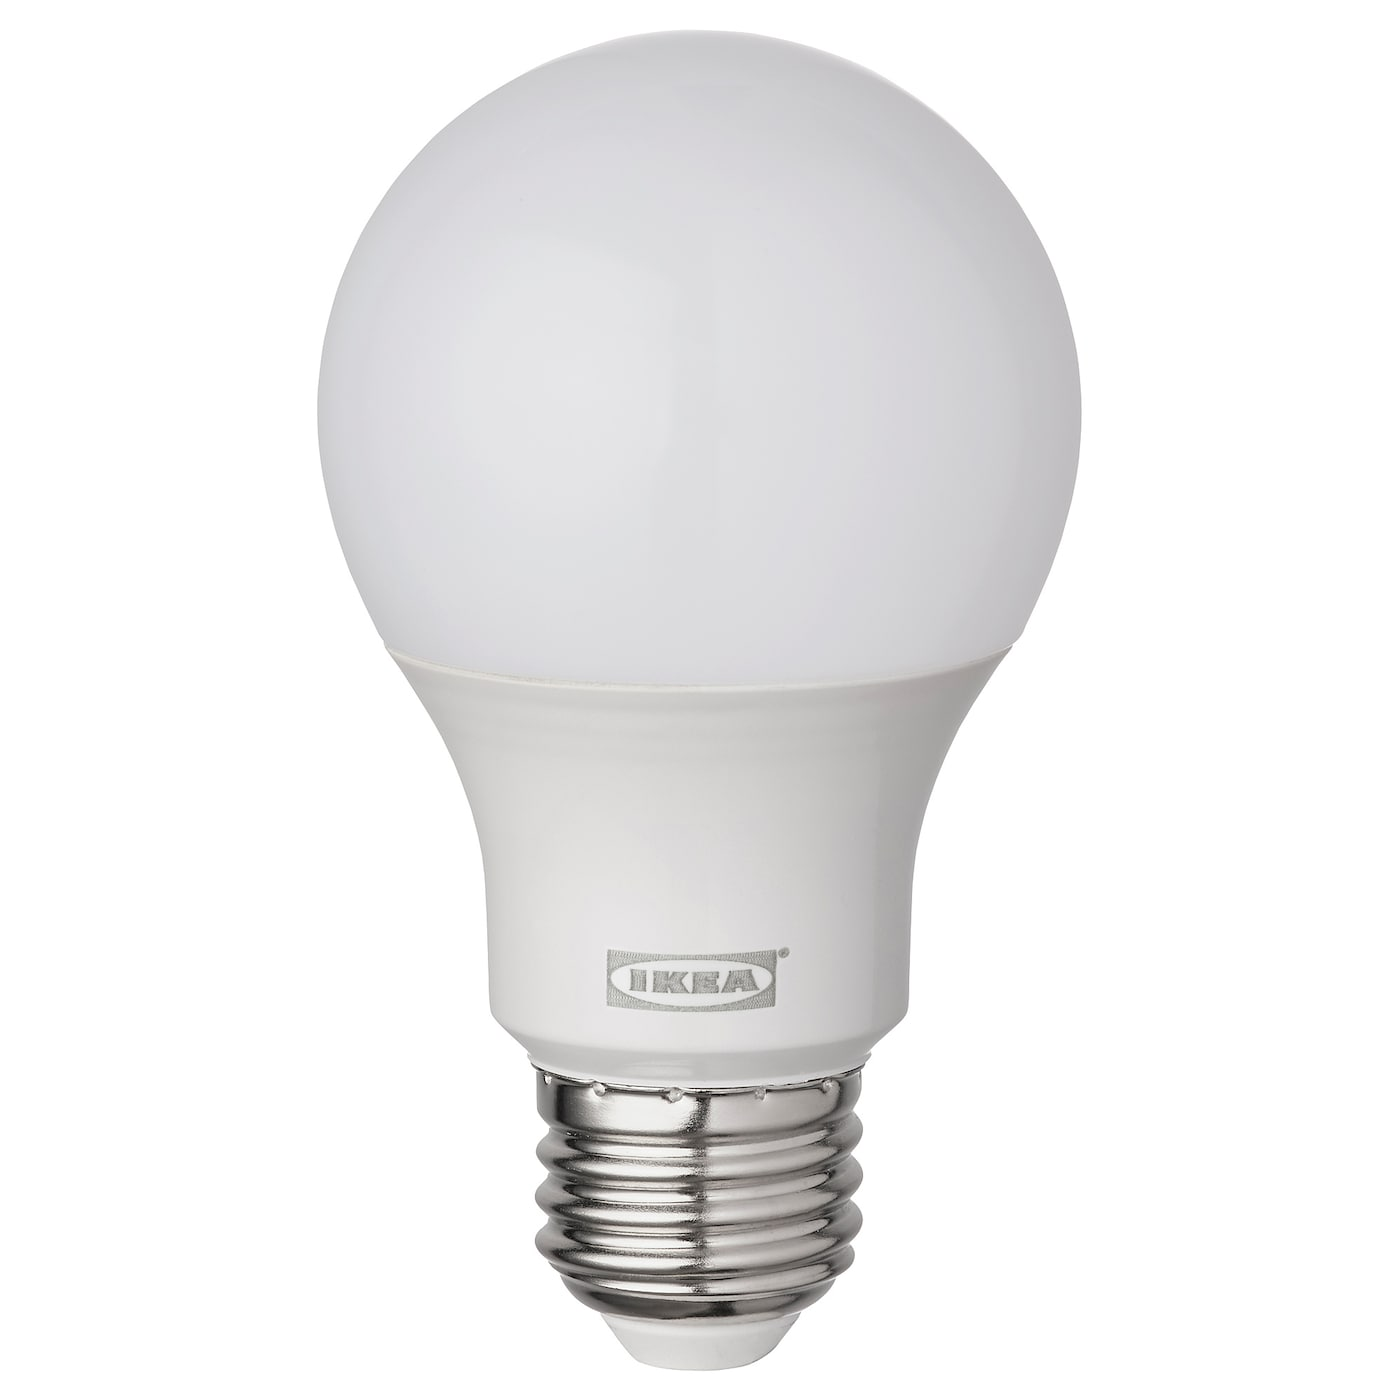 RYET LED bulb E26 450 lumen, globe opal